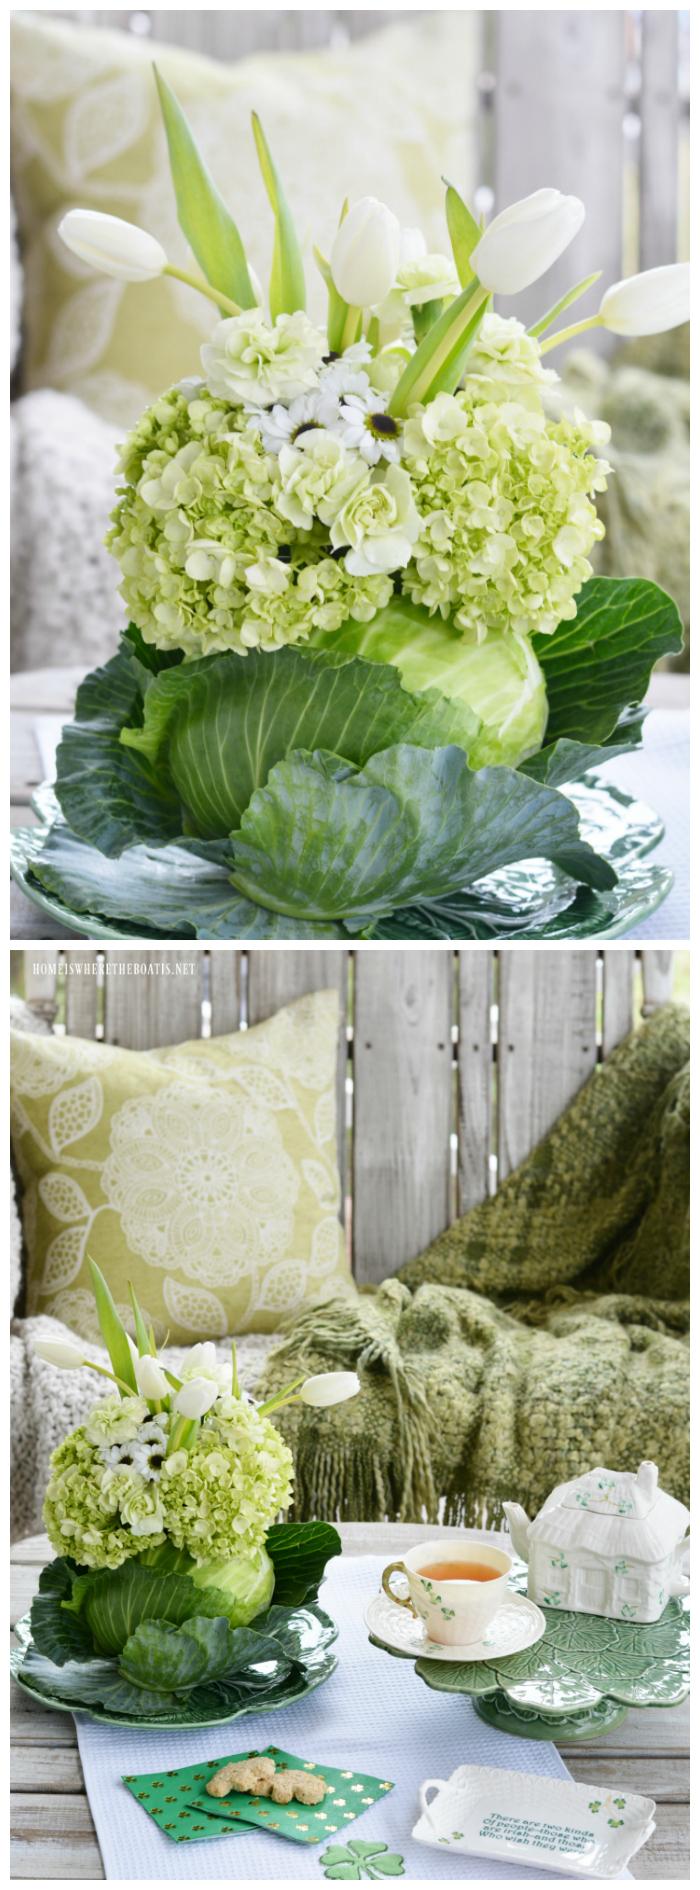 Blooming Cabbage Vase DIY| ©homeiswheretheboatis.net #stpatricksday #flowers #cabbage